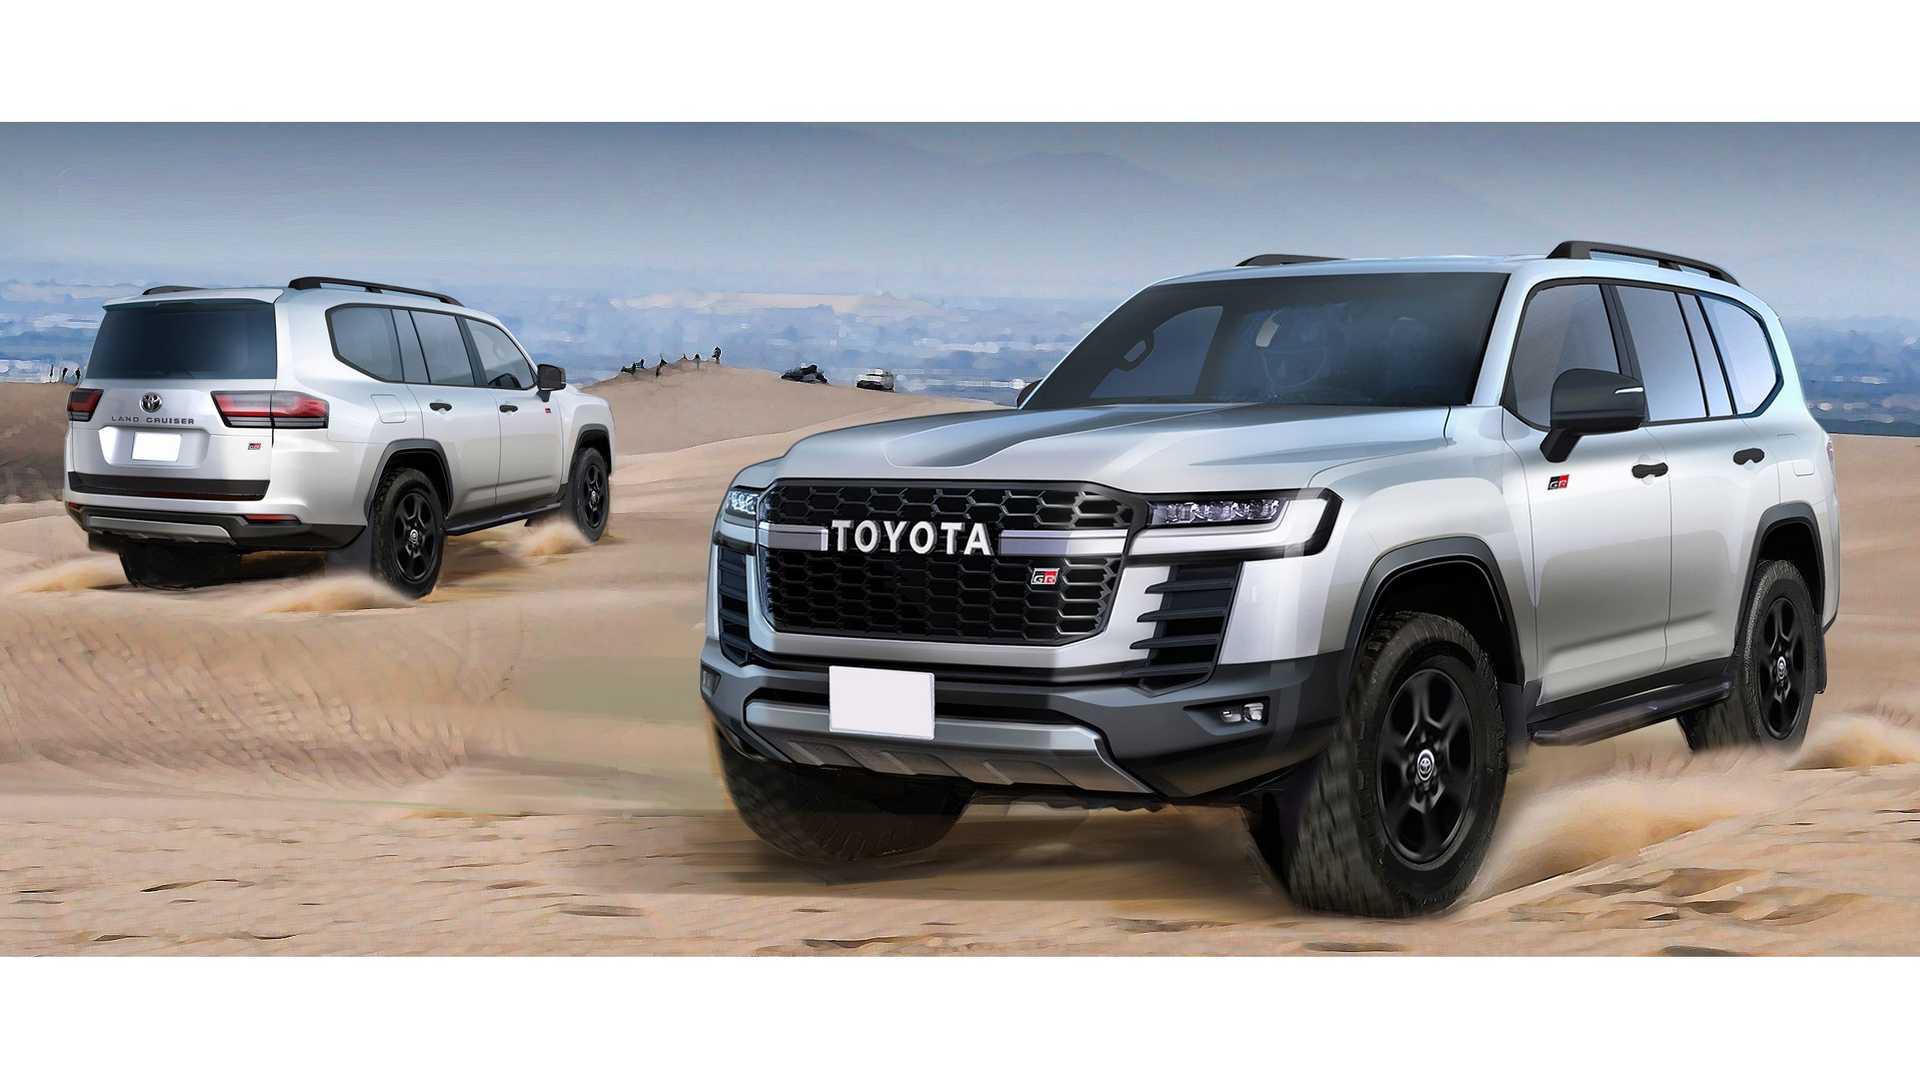 Toyota-Land-Cruiser-design-sketches-12